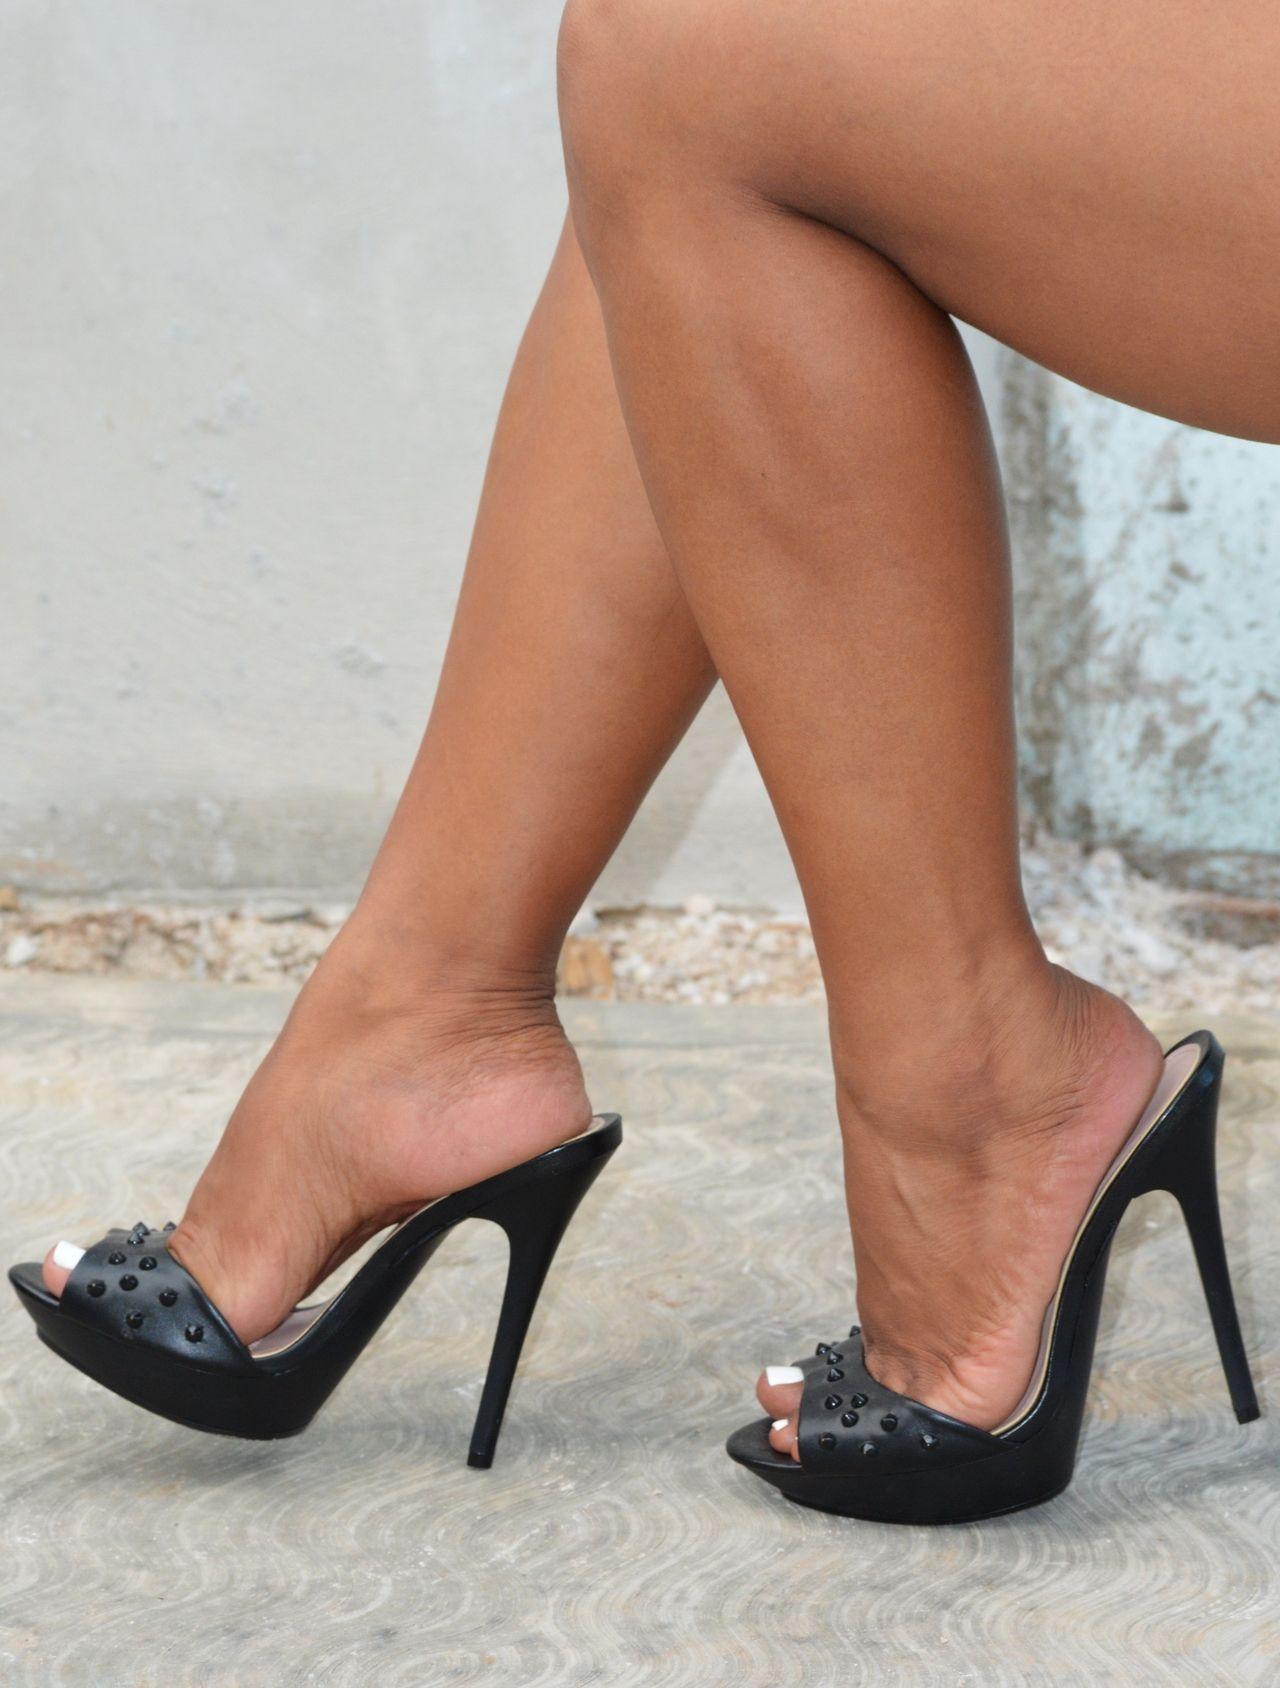 anal high heels